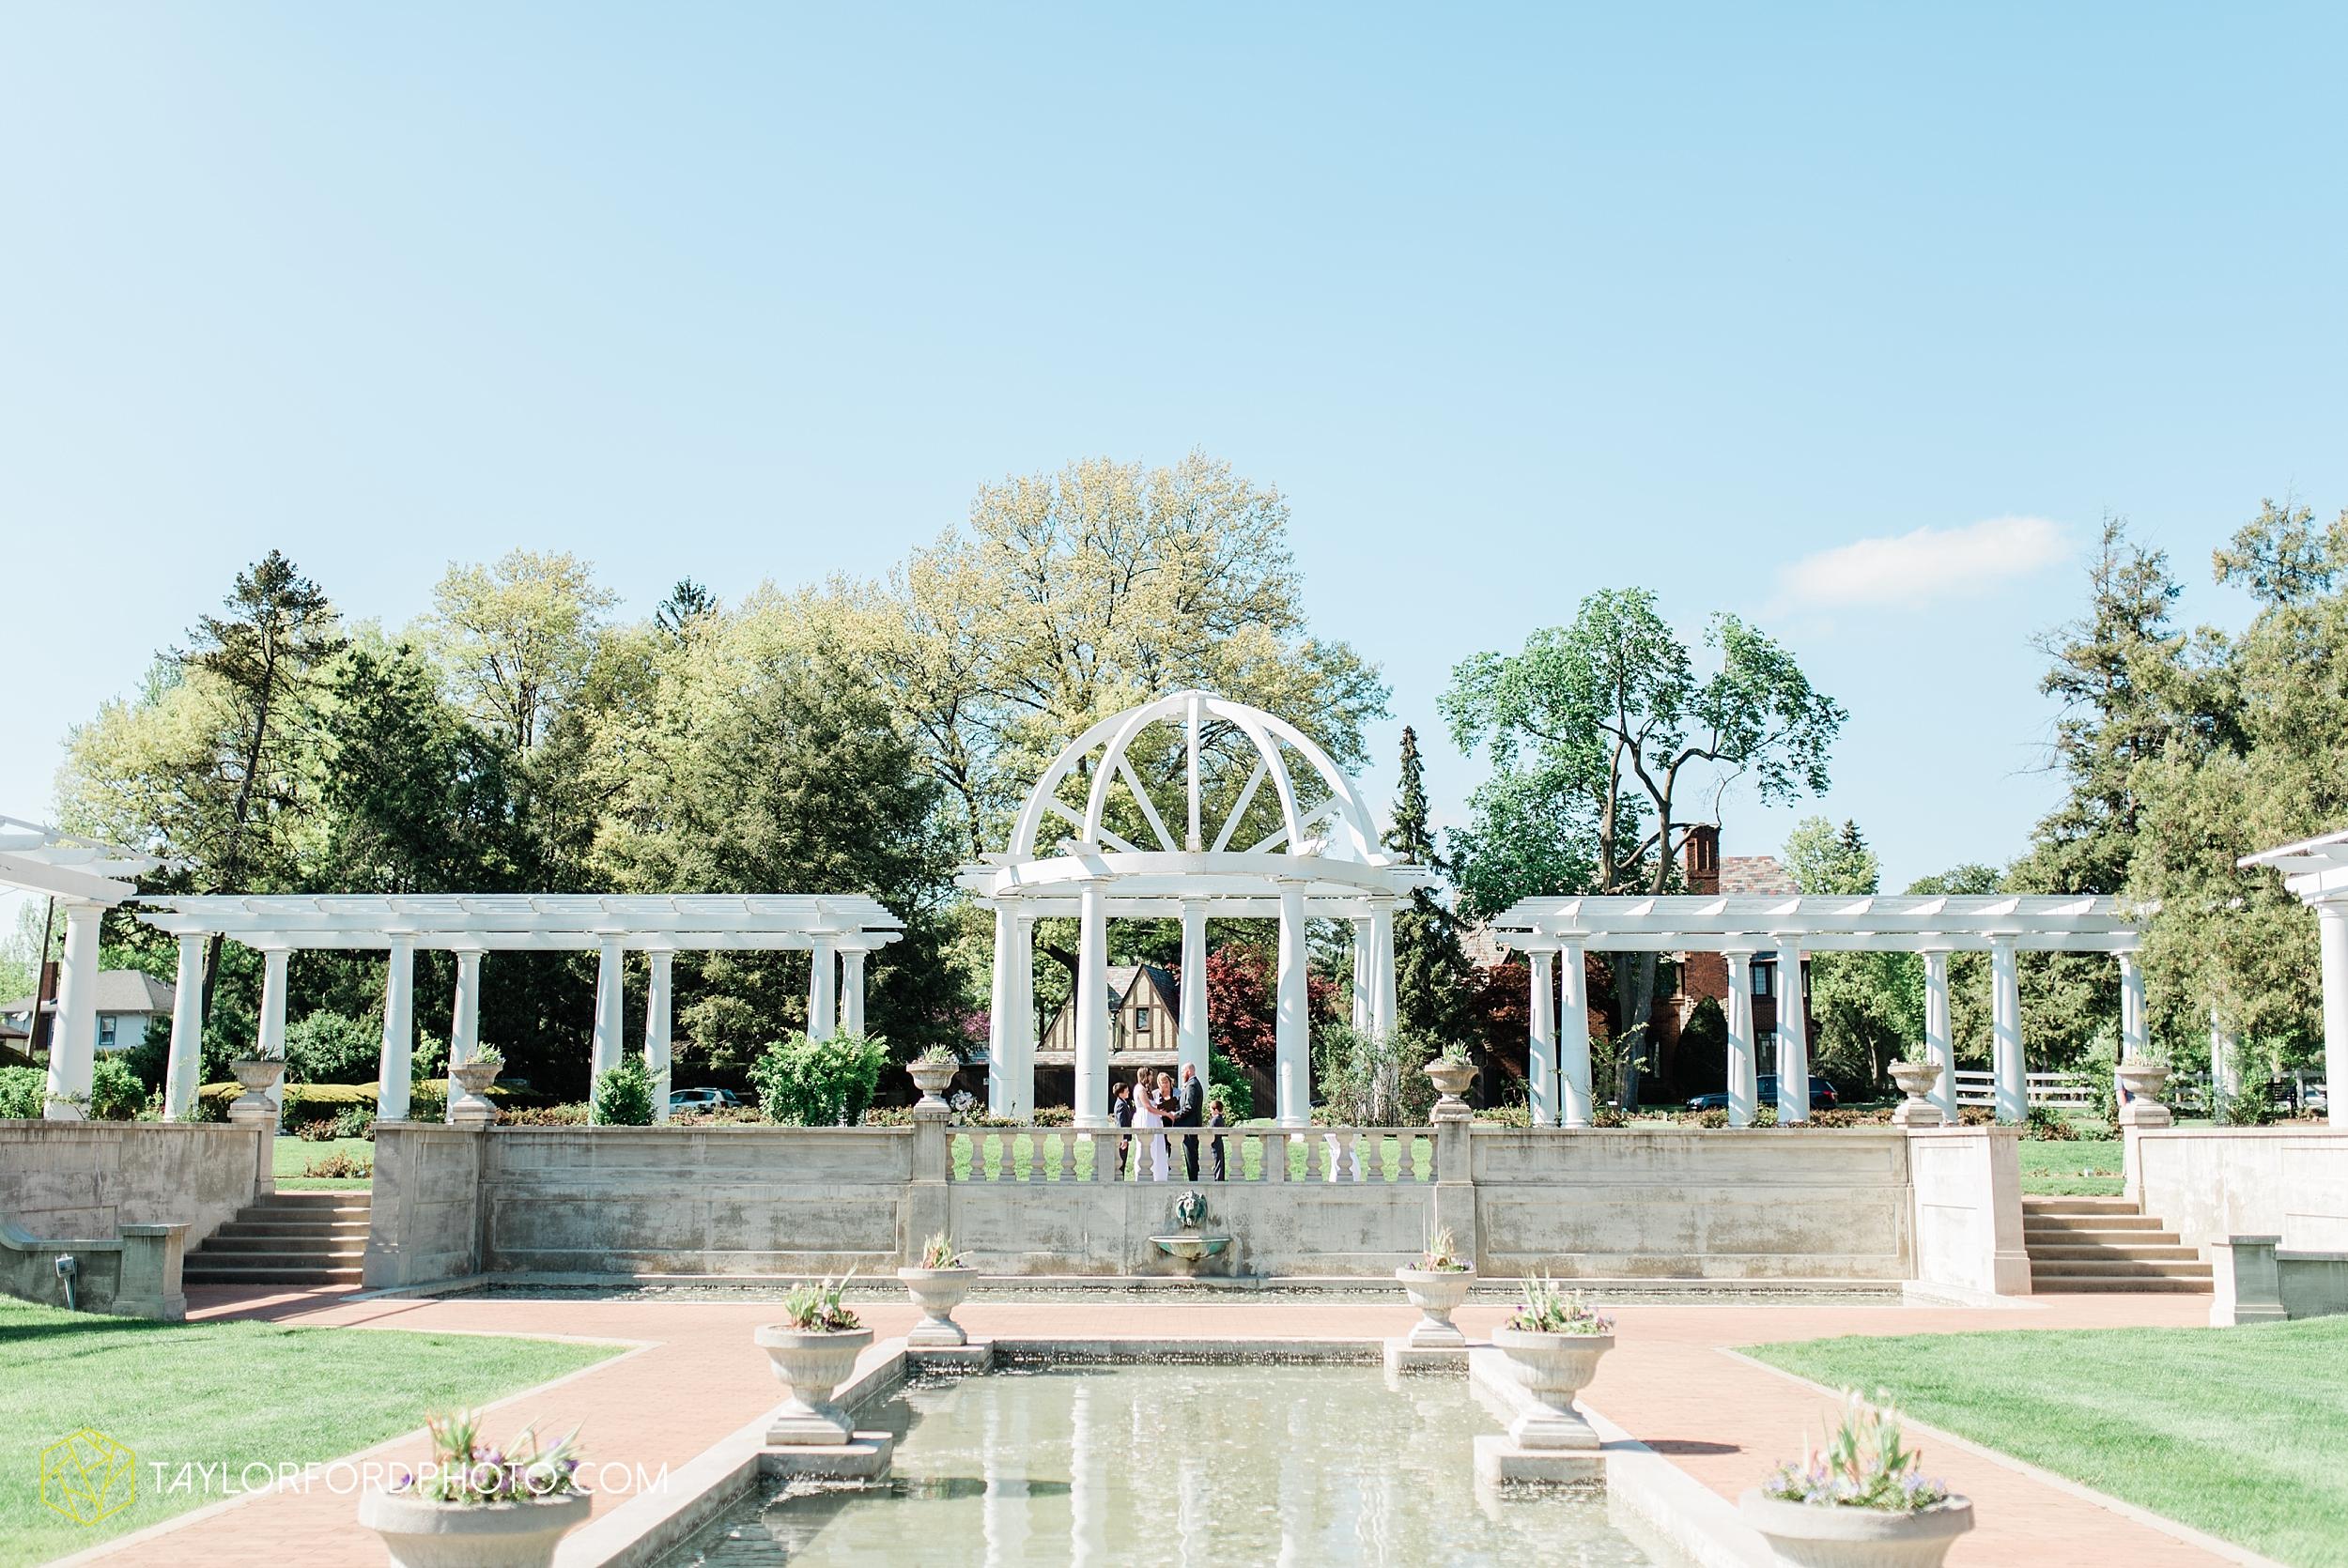 lakeside-rose-gardens-fort-wayne-indiana-elopement-wedding-photographer-Taylor-Ford-Photography_7143.jpg